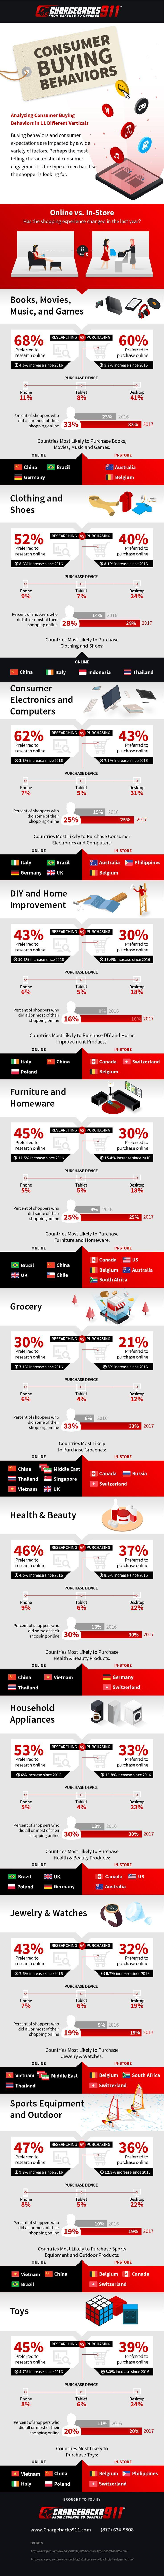 Analyzing Consumer Buying Behavior in 11 Different Verticals - infographic